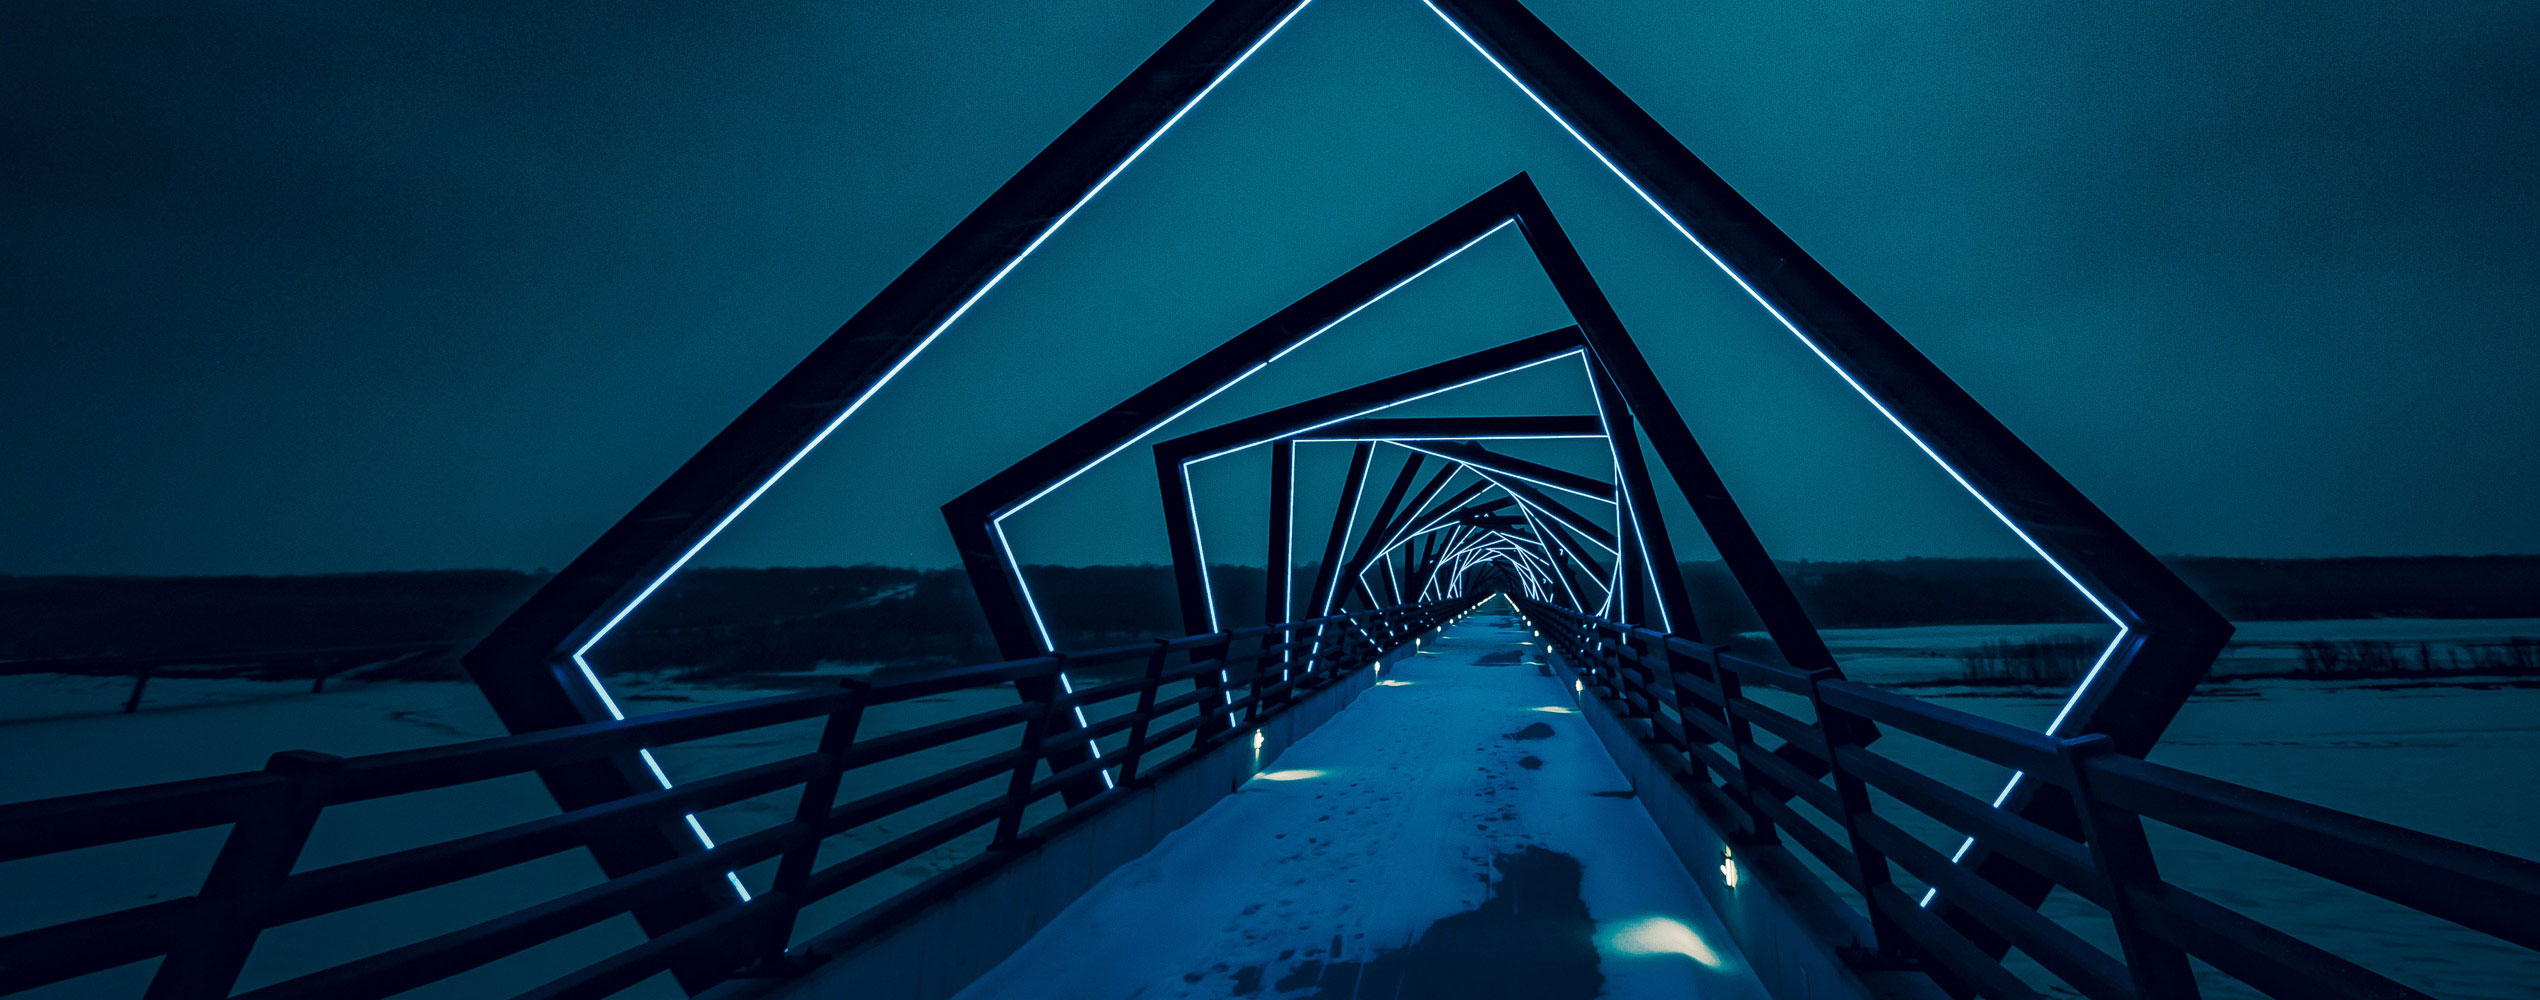 Brücke Abstrakt unsplash